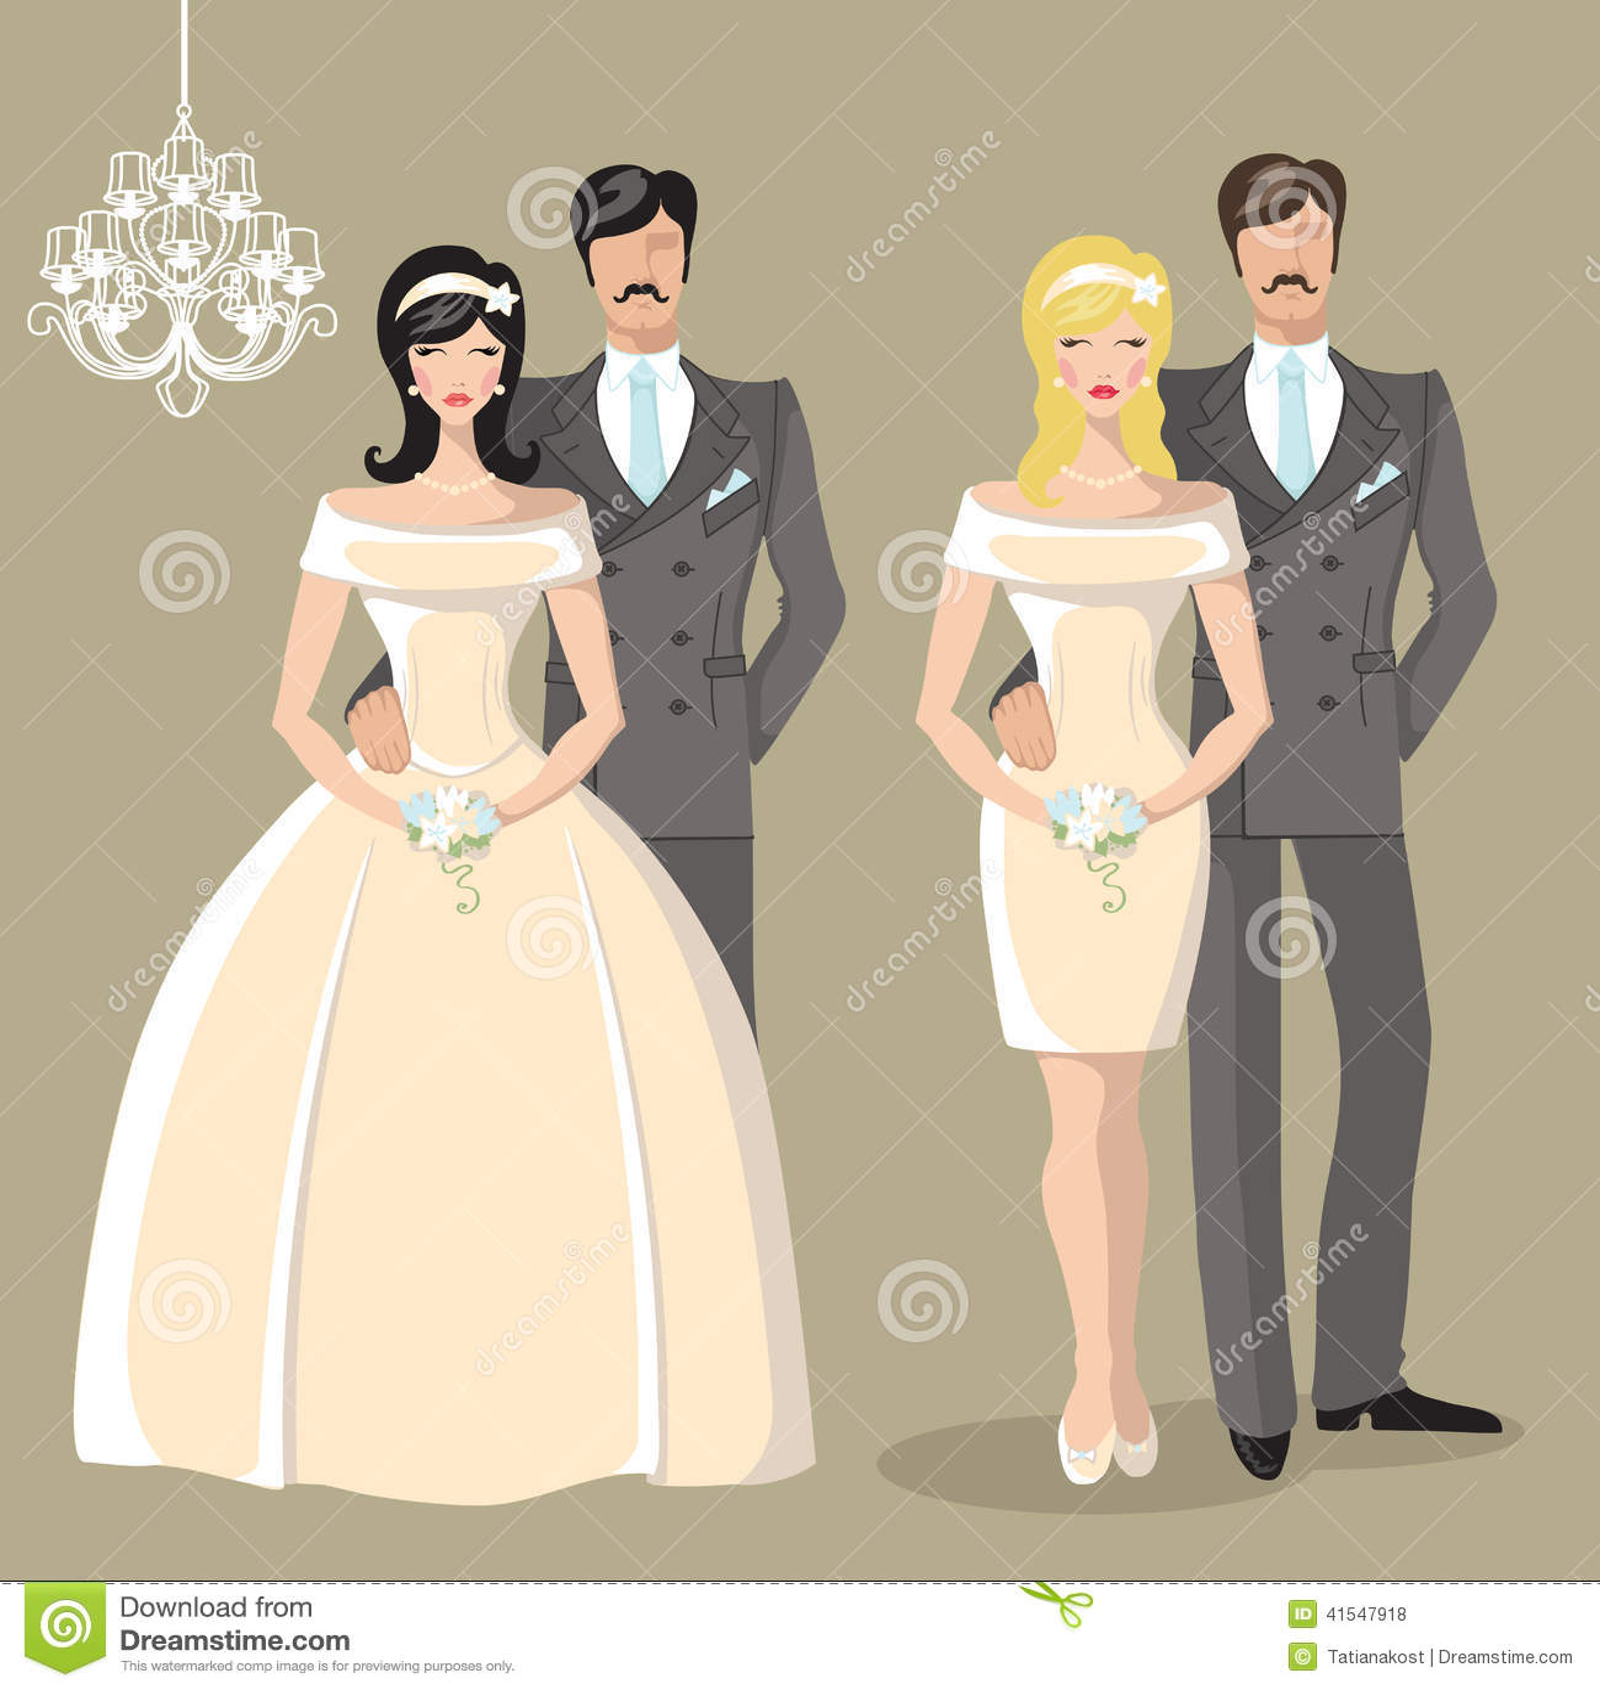 Cute Wedding Set Of Cartoon Bride And Groom Stock Vector Image 41547918